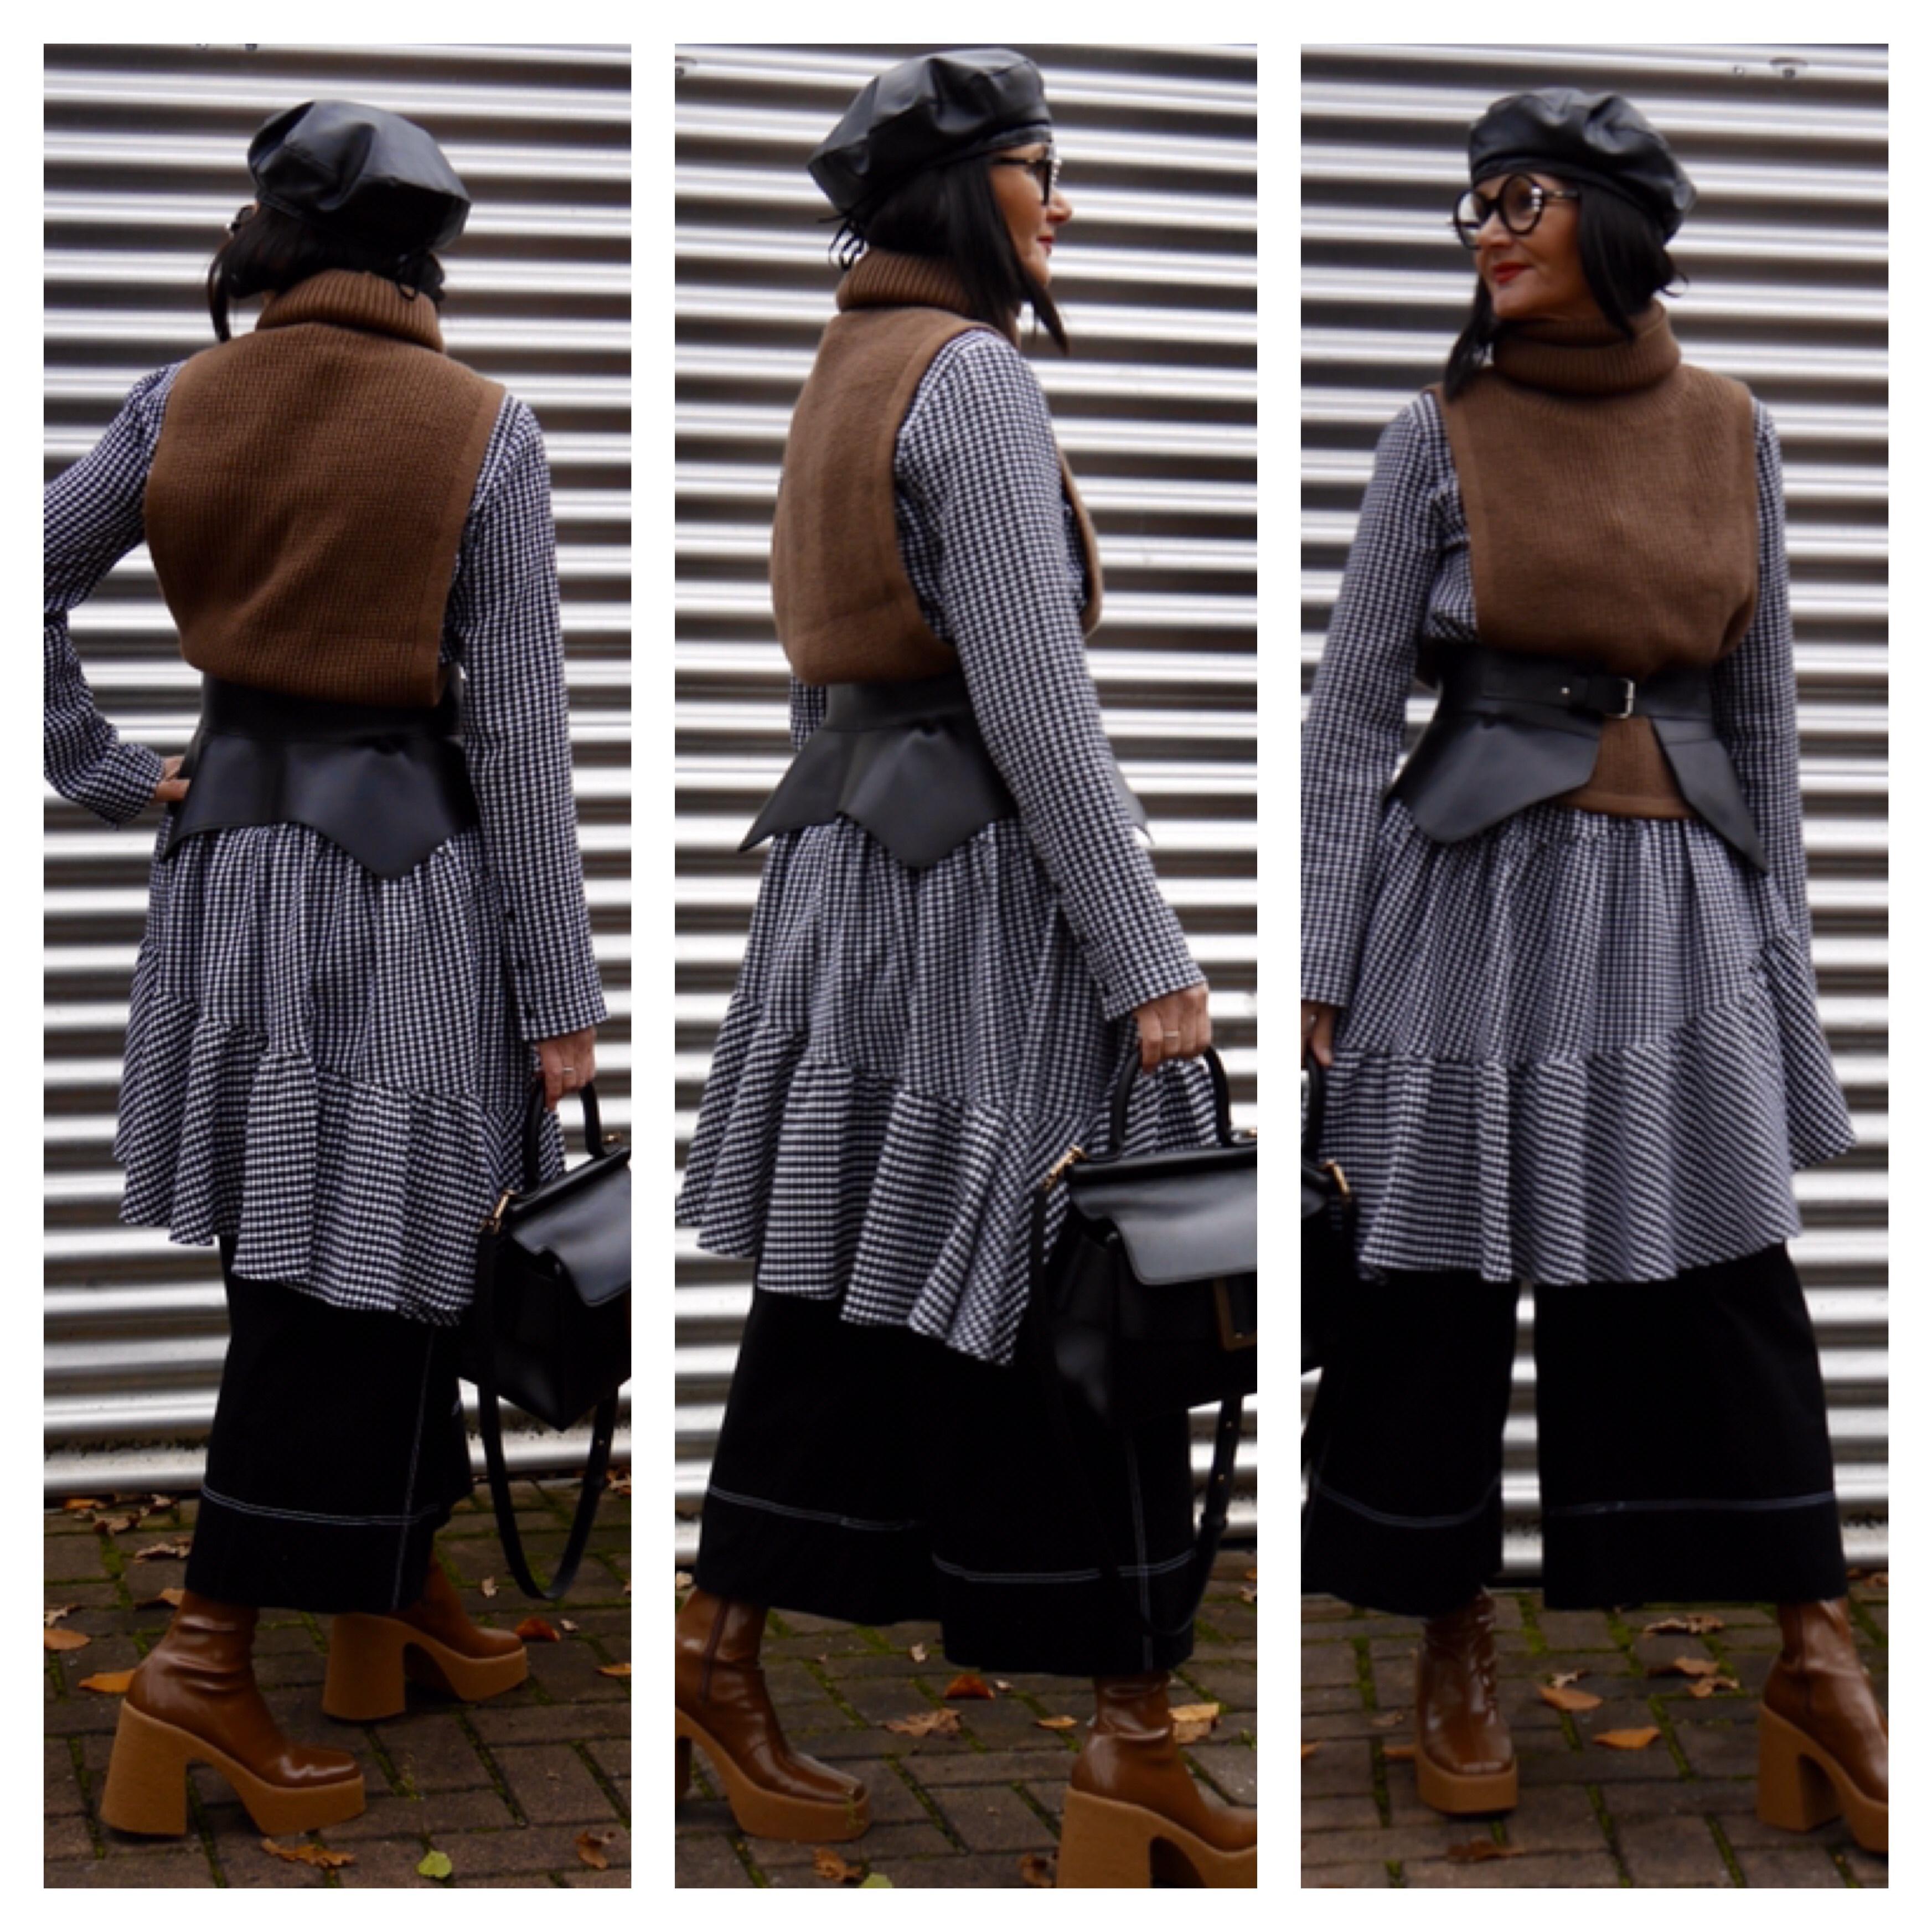 Pullunder mit Rollkragen, Lowe-Gürtel über Kleid, Culotte, Stella McCartney-Boots, Boyy-Bag